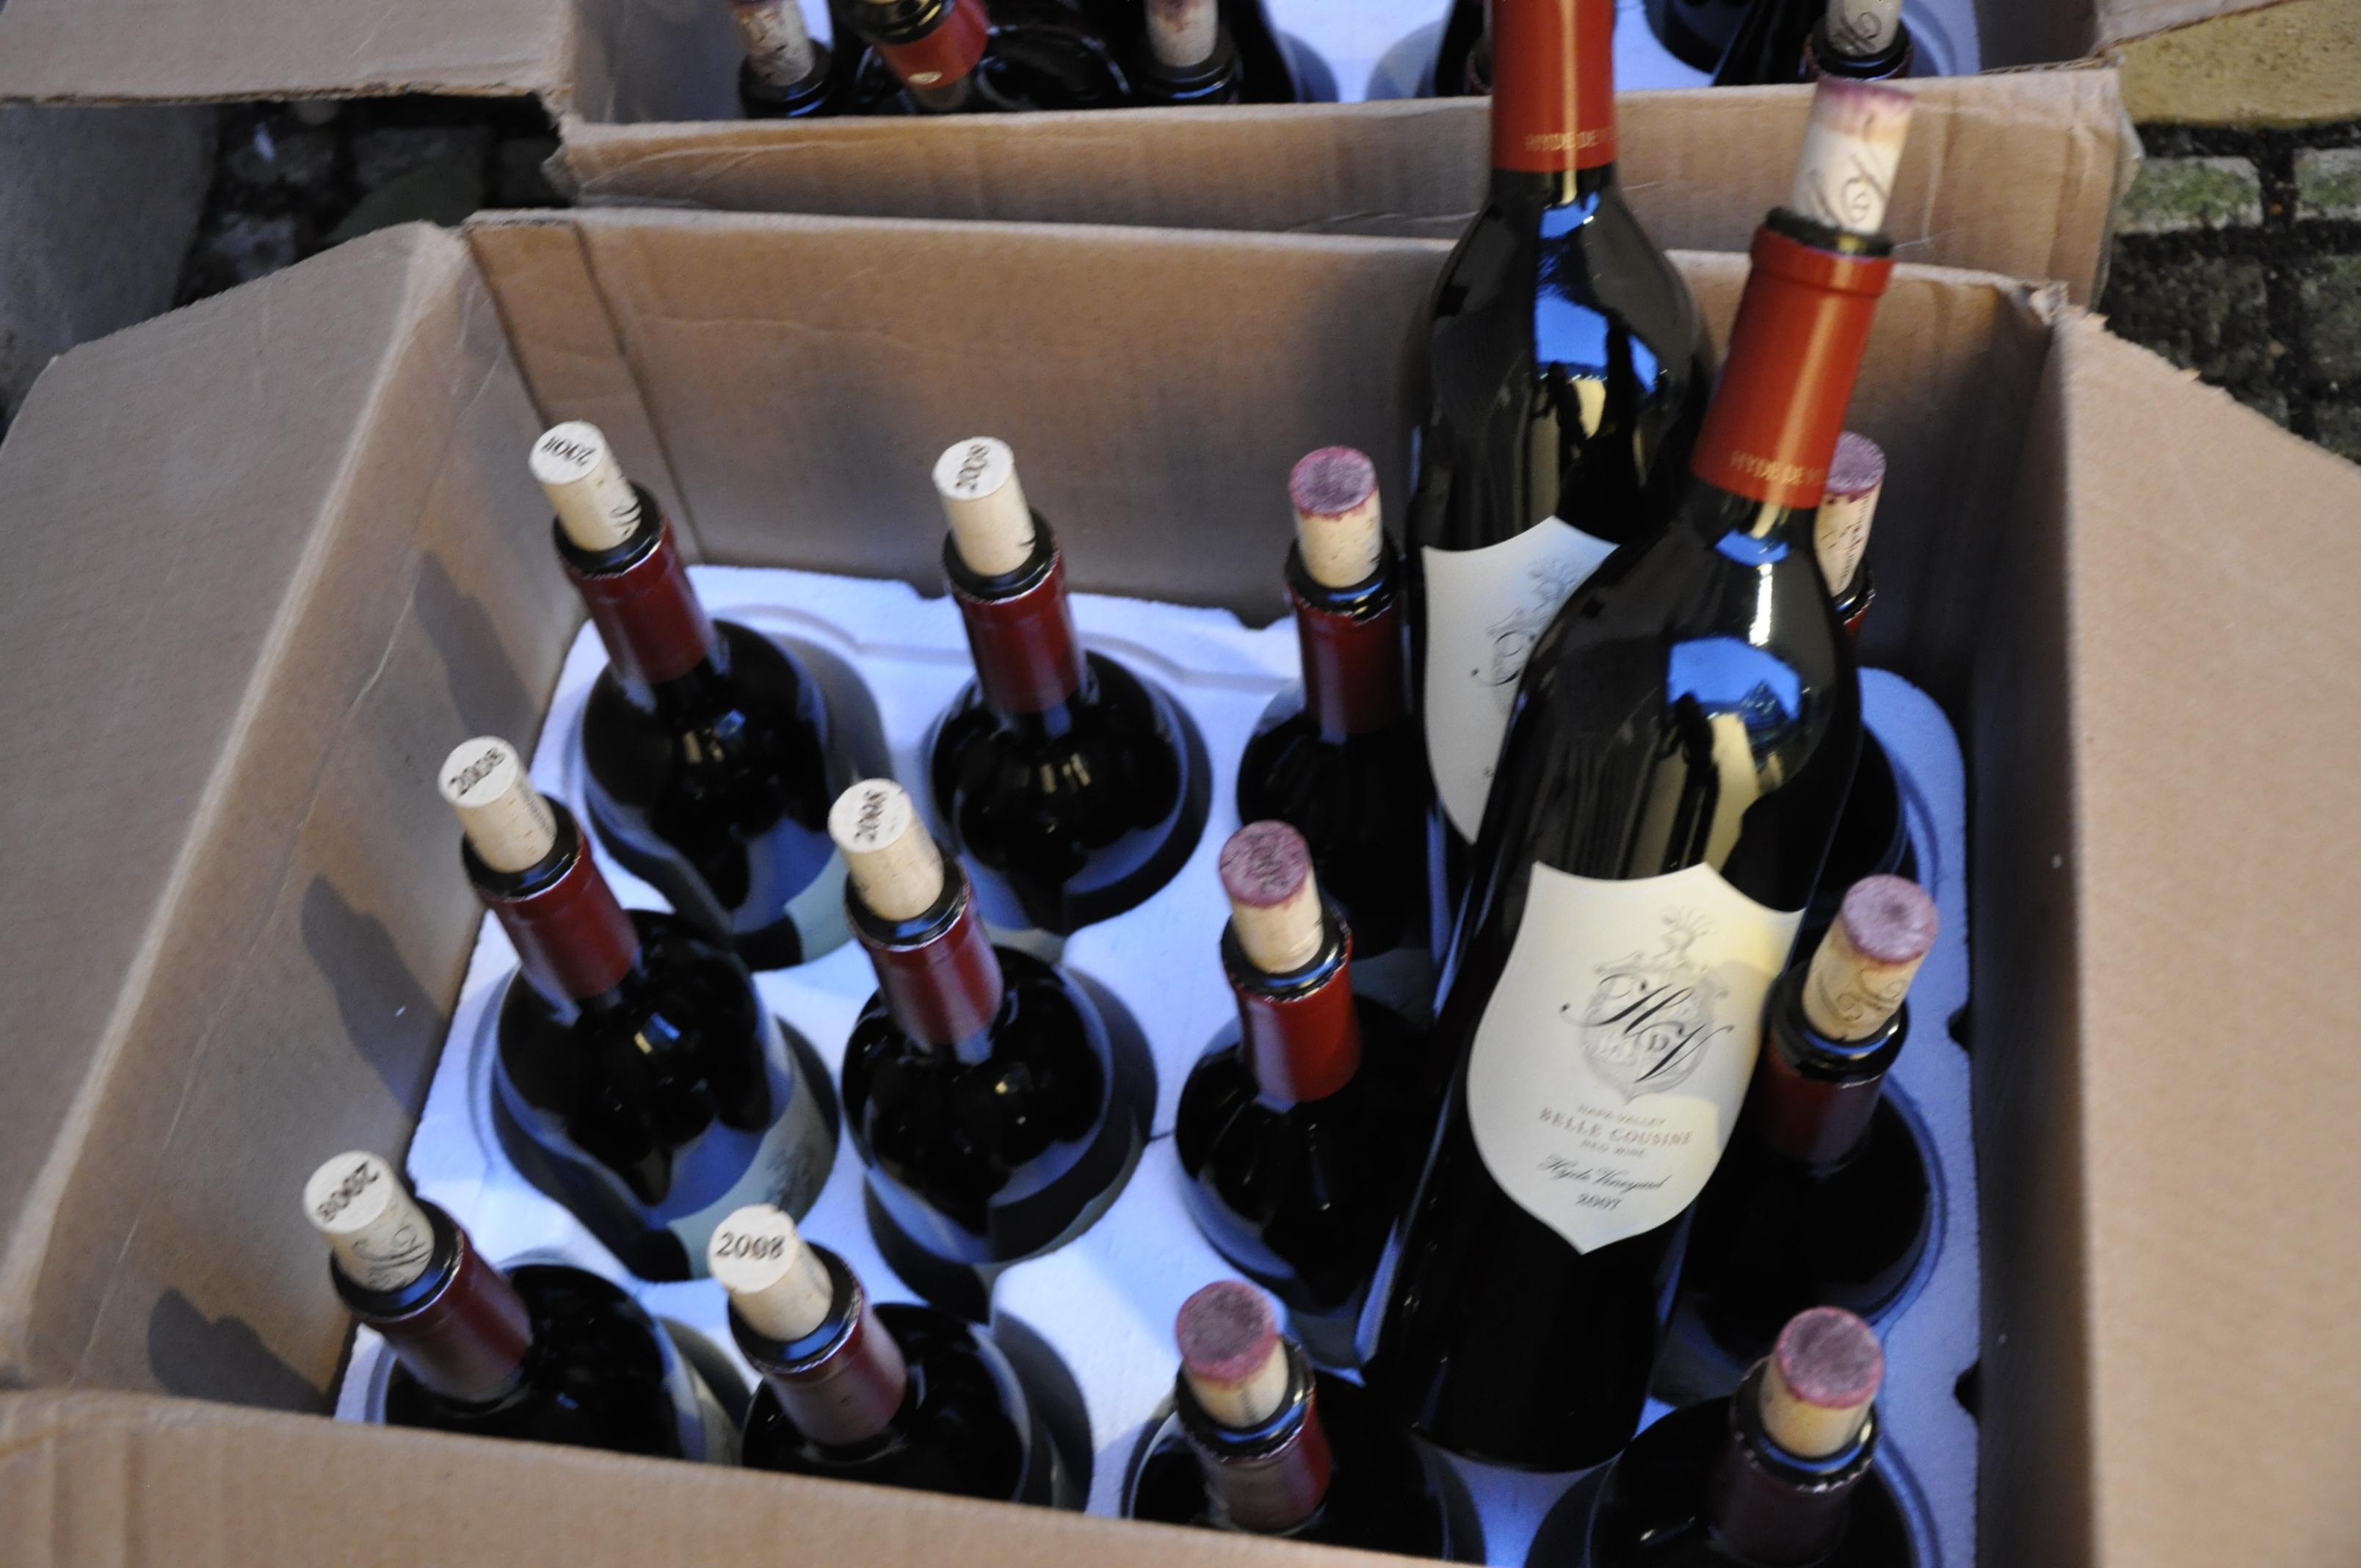 Hyde de Villaine Wines